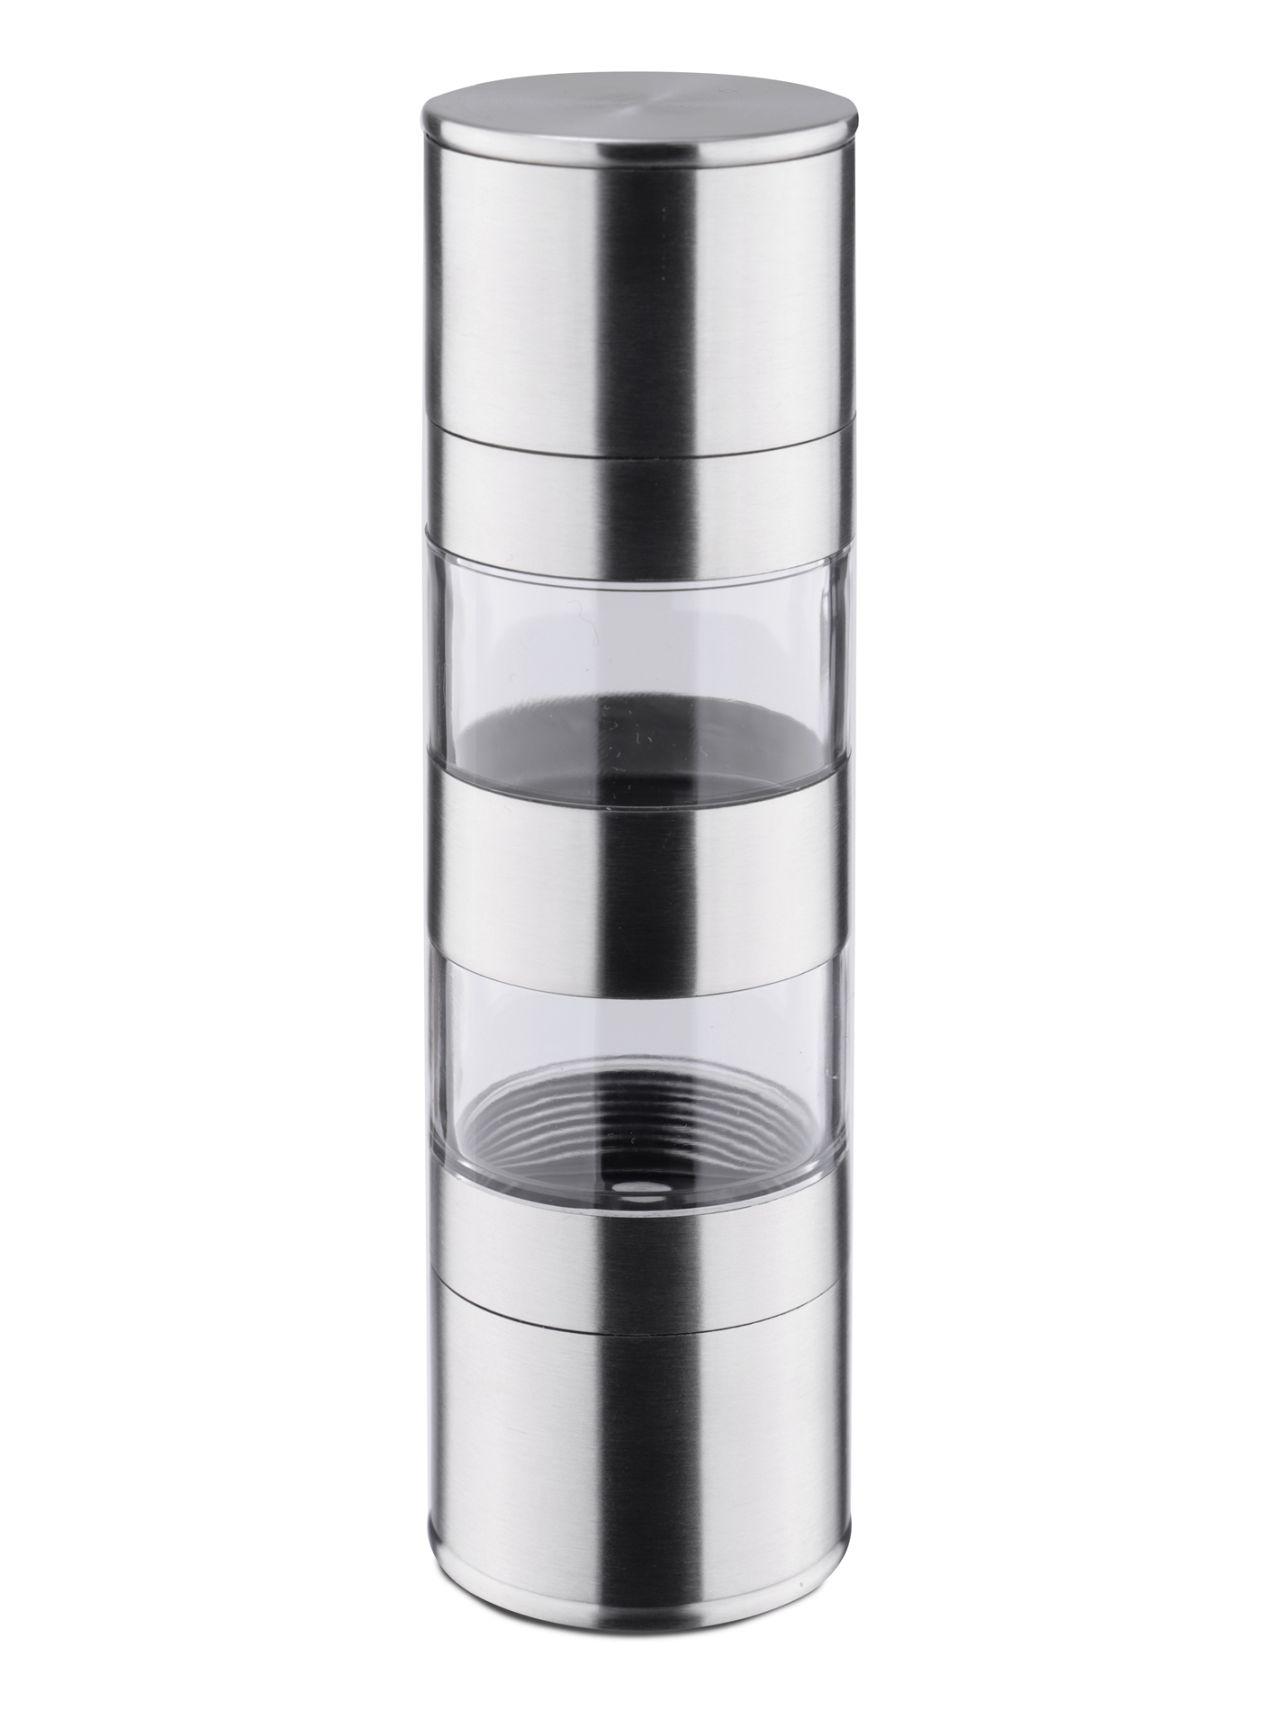 Oboustranný mlýnek na pepř a sůl 19 cm - Weis